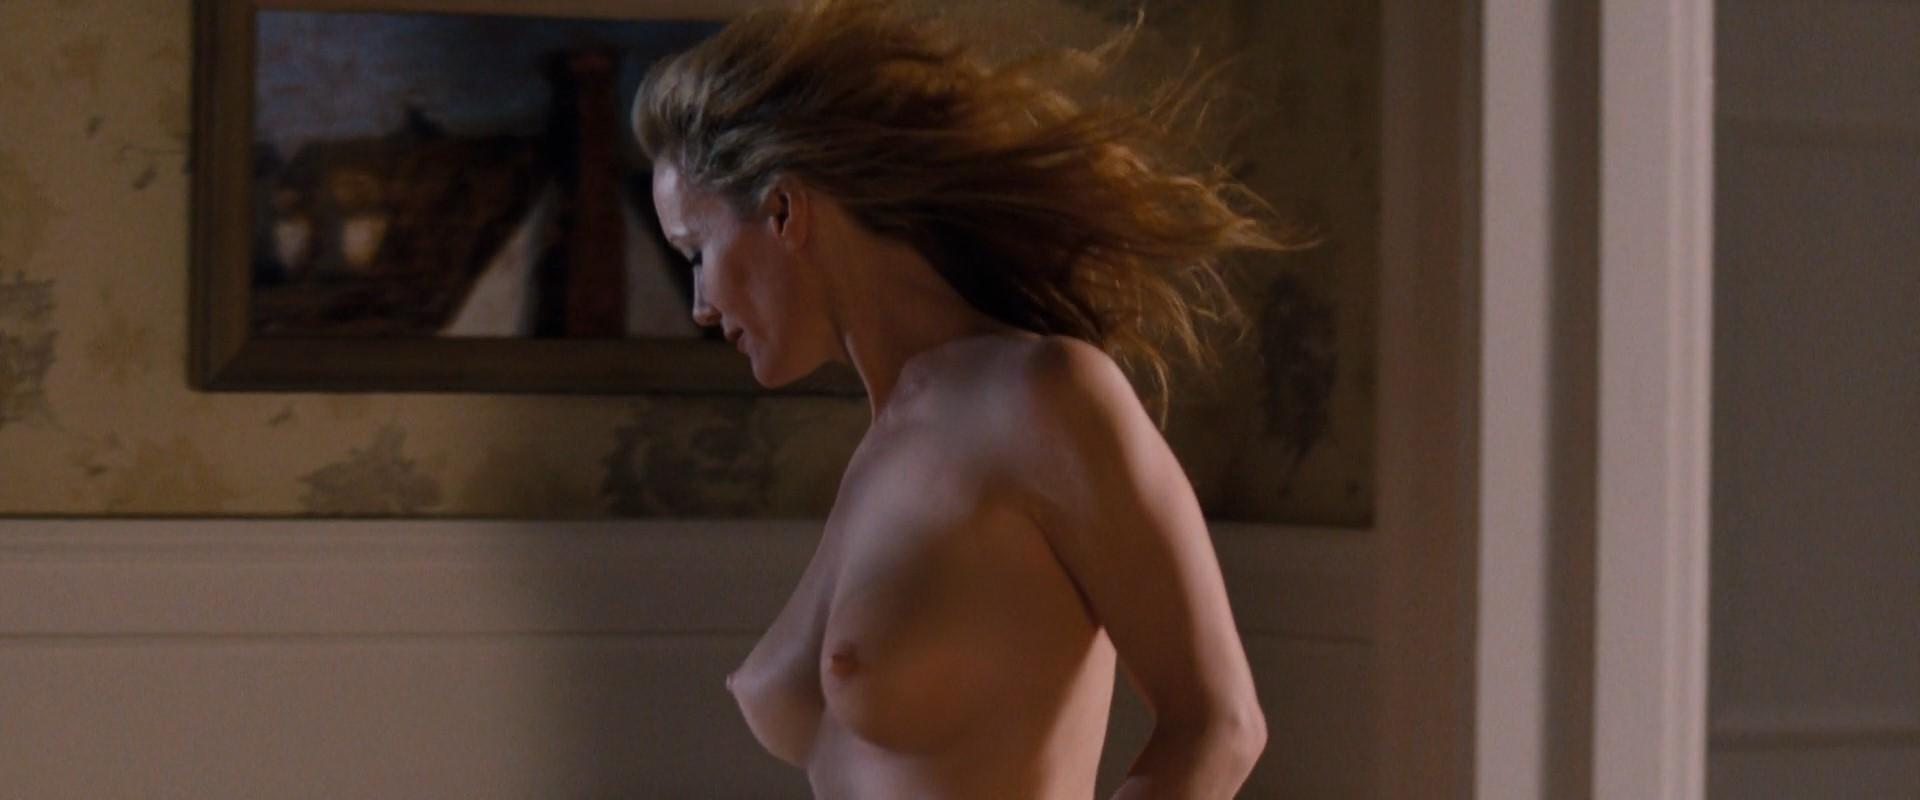 becca-mann-naked-photos